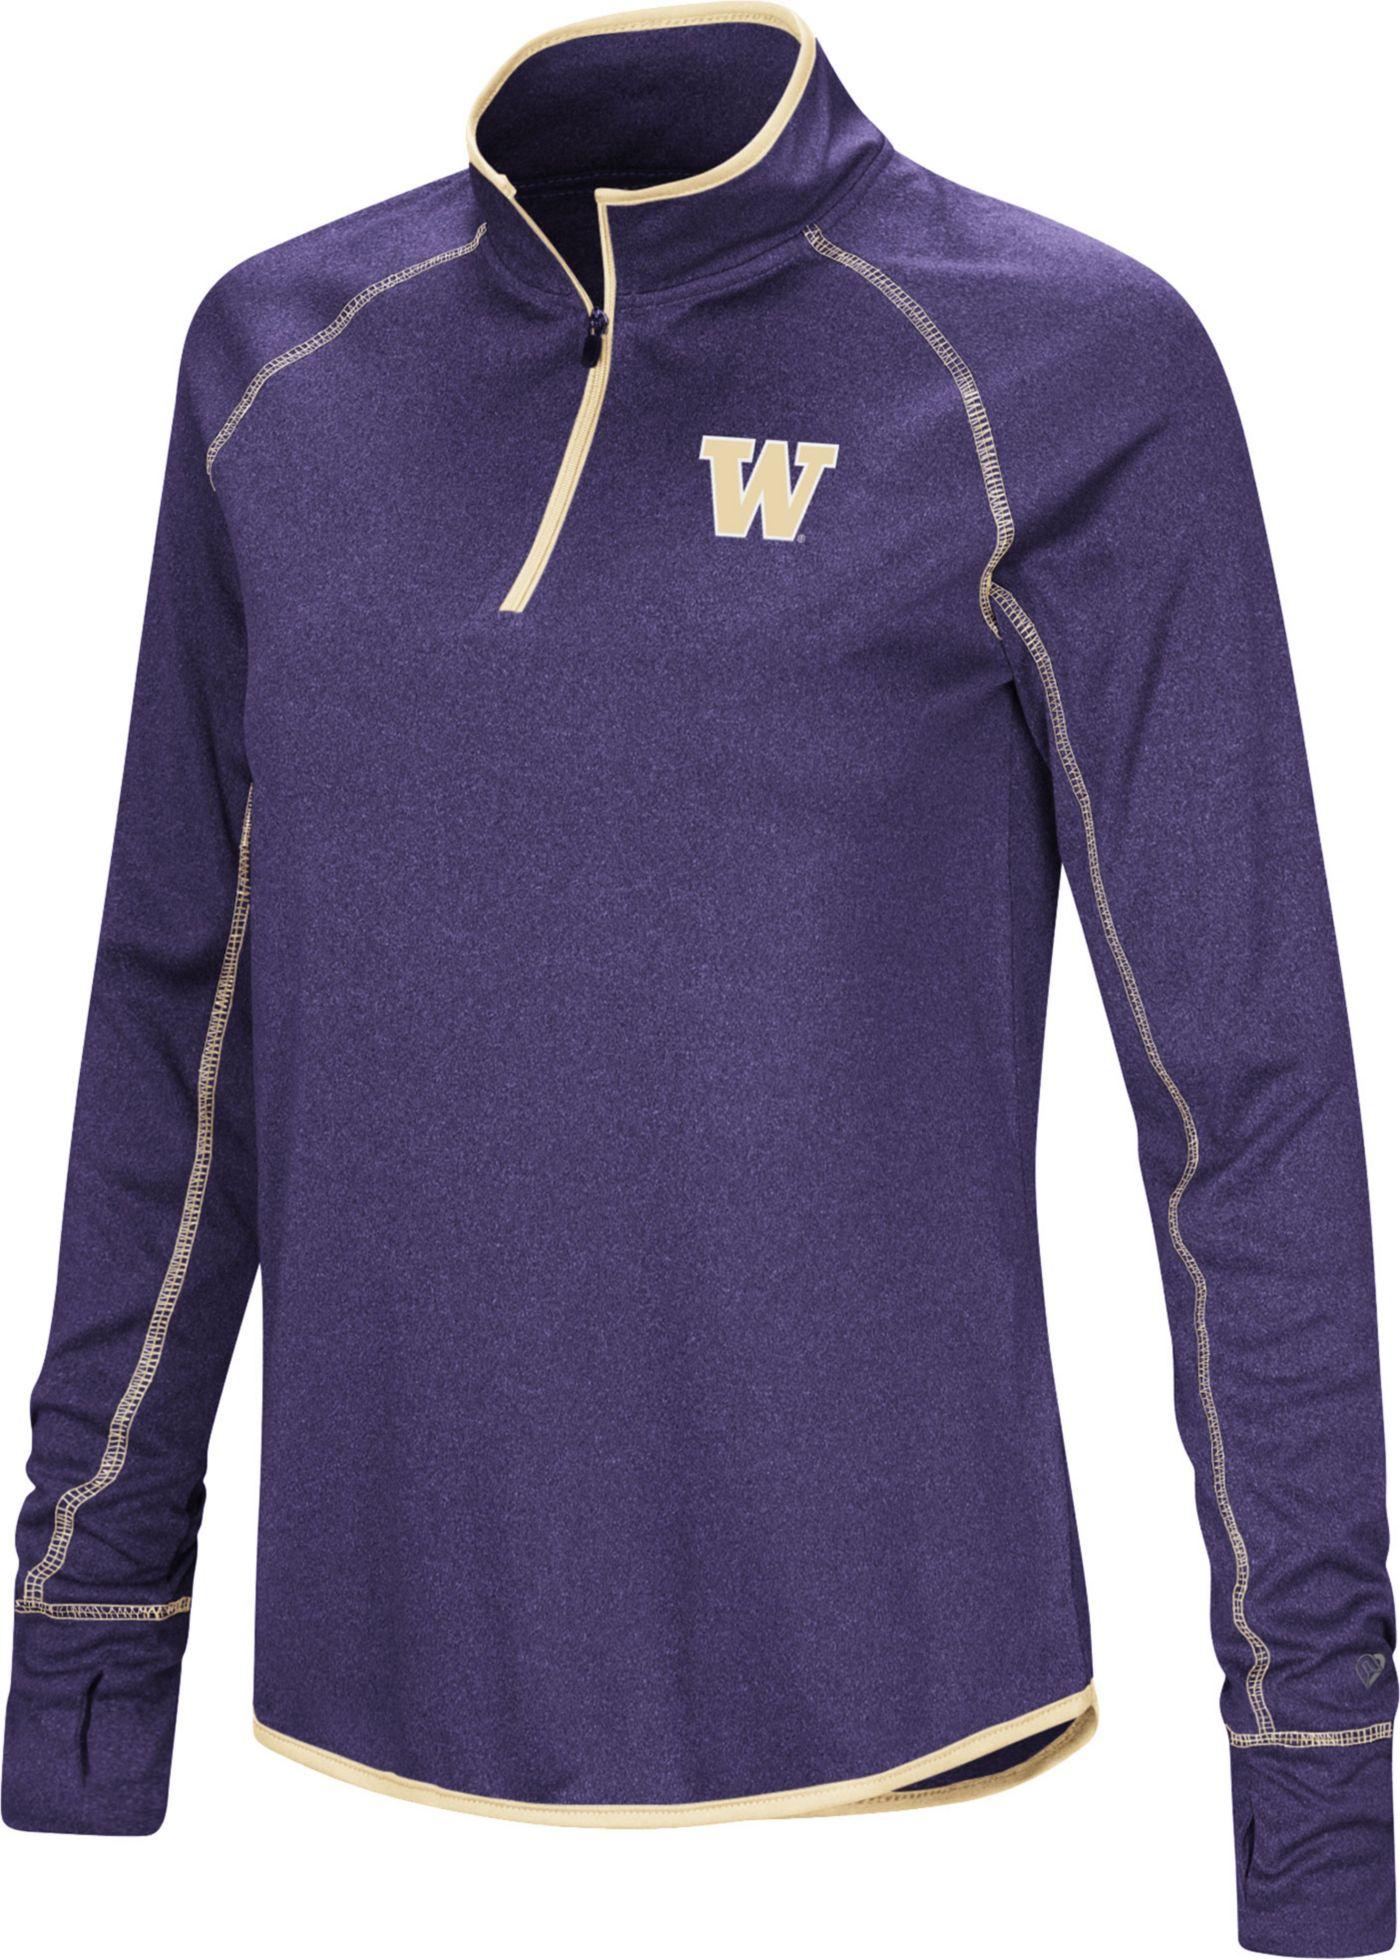 Colosseum Women's Washington Huskies Purple Stingray Quarter-Zip Shirt